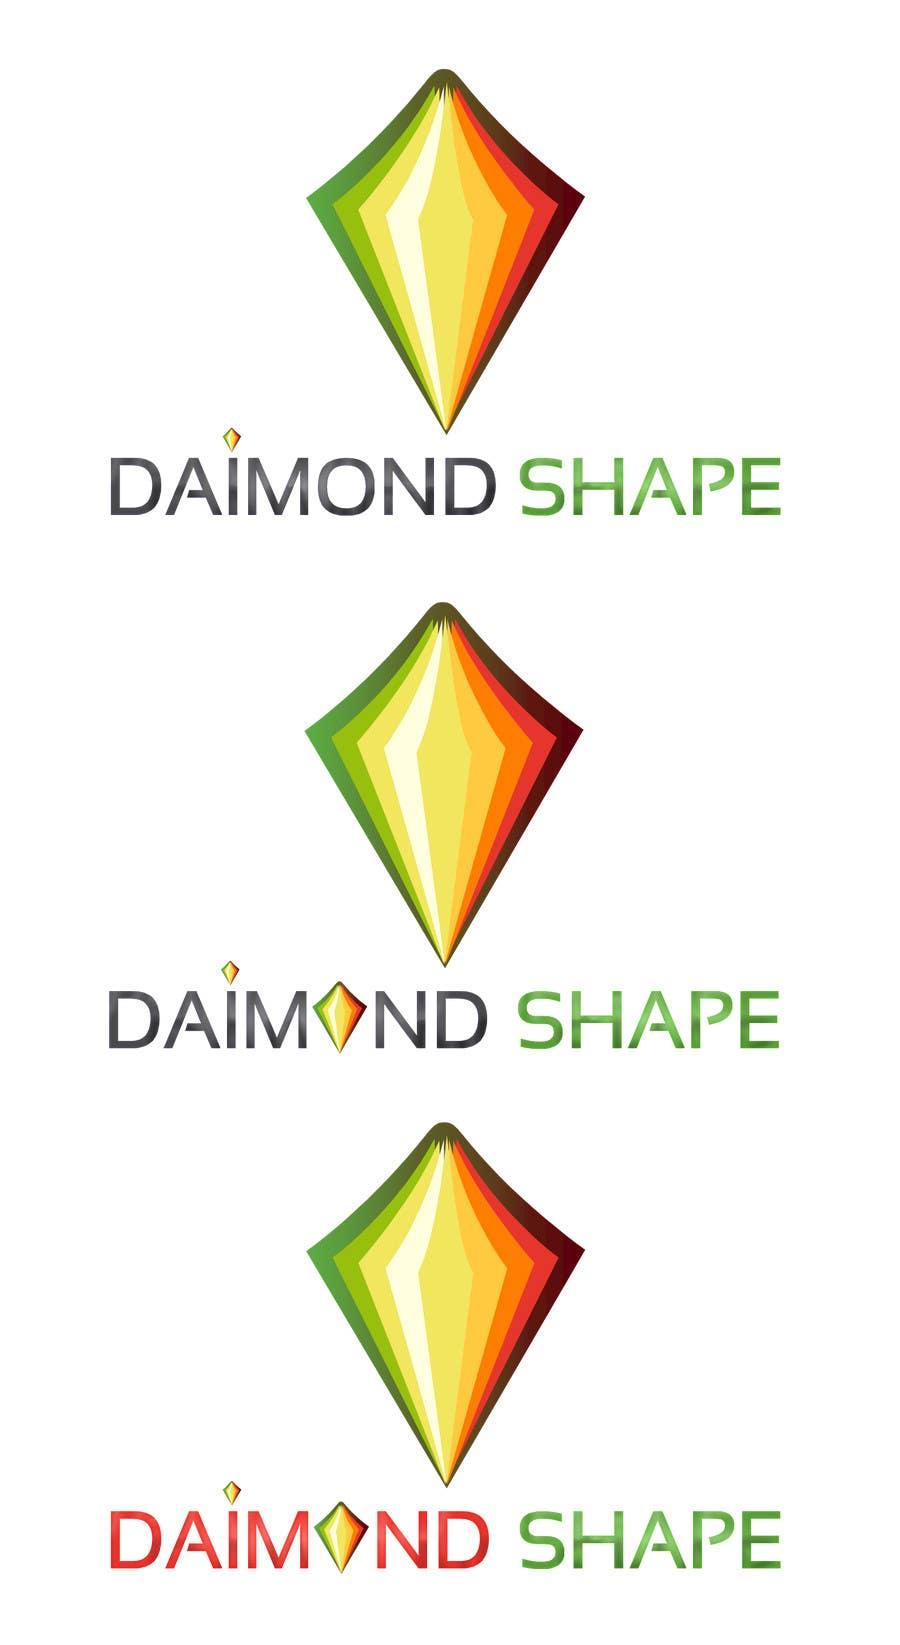 Penyertaan Peraduan #9 untuk DiamondShape.com Logo & Header